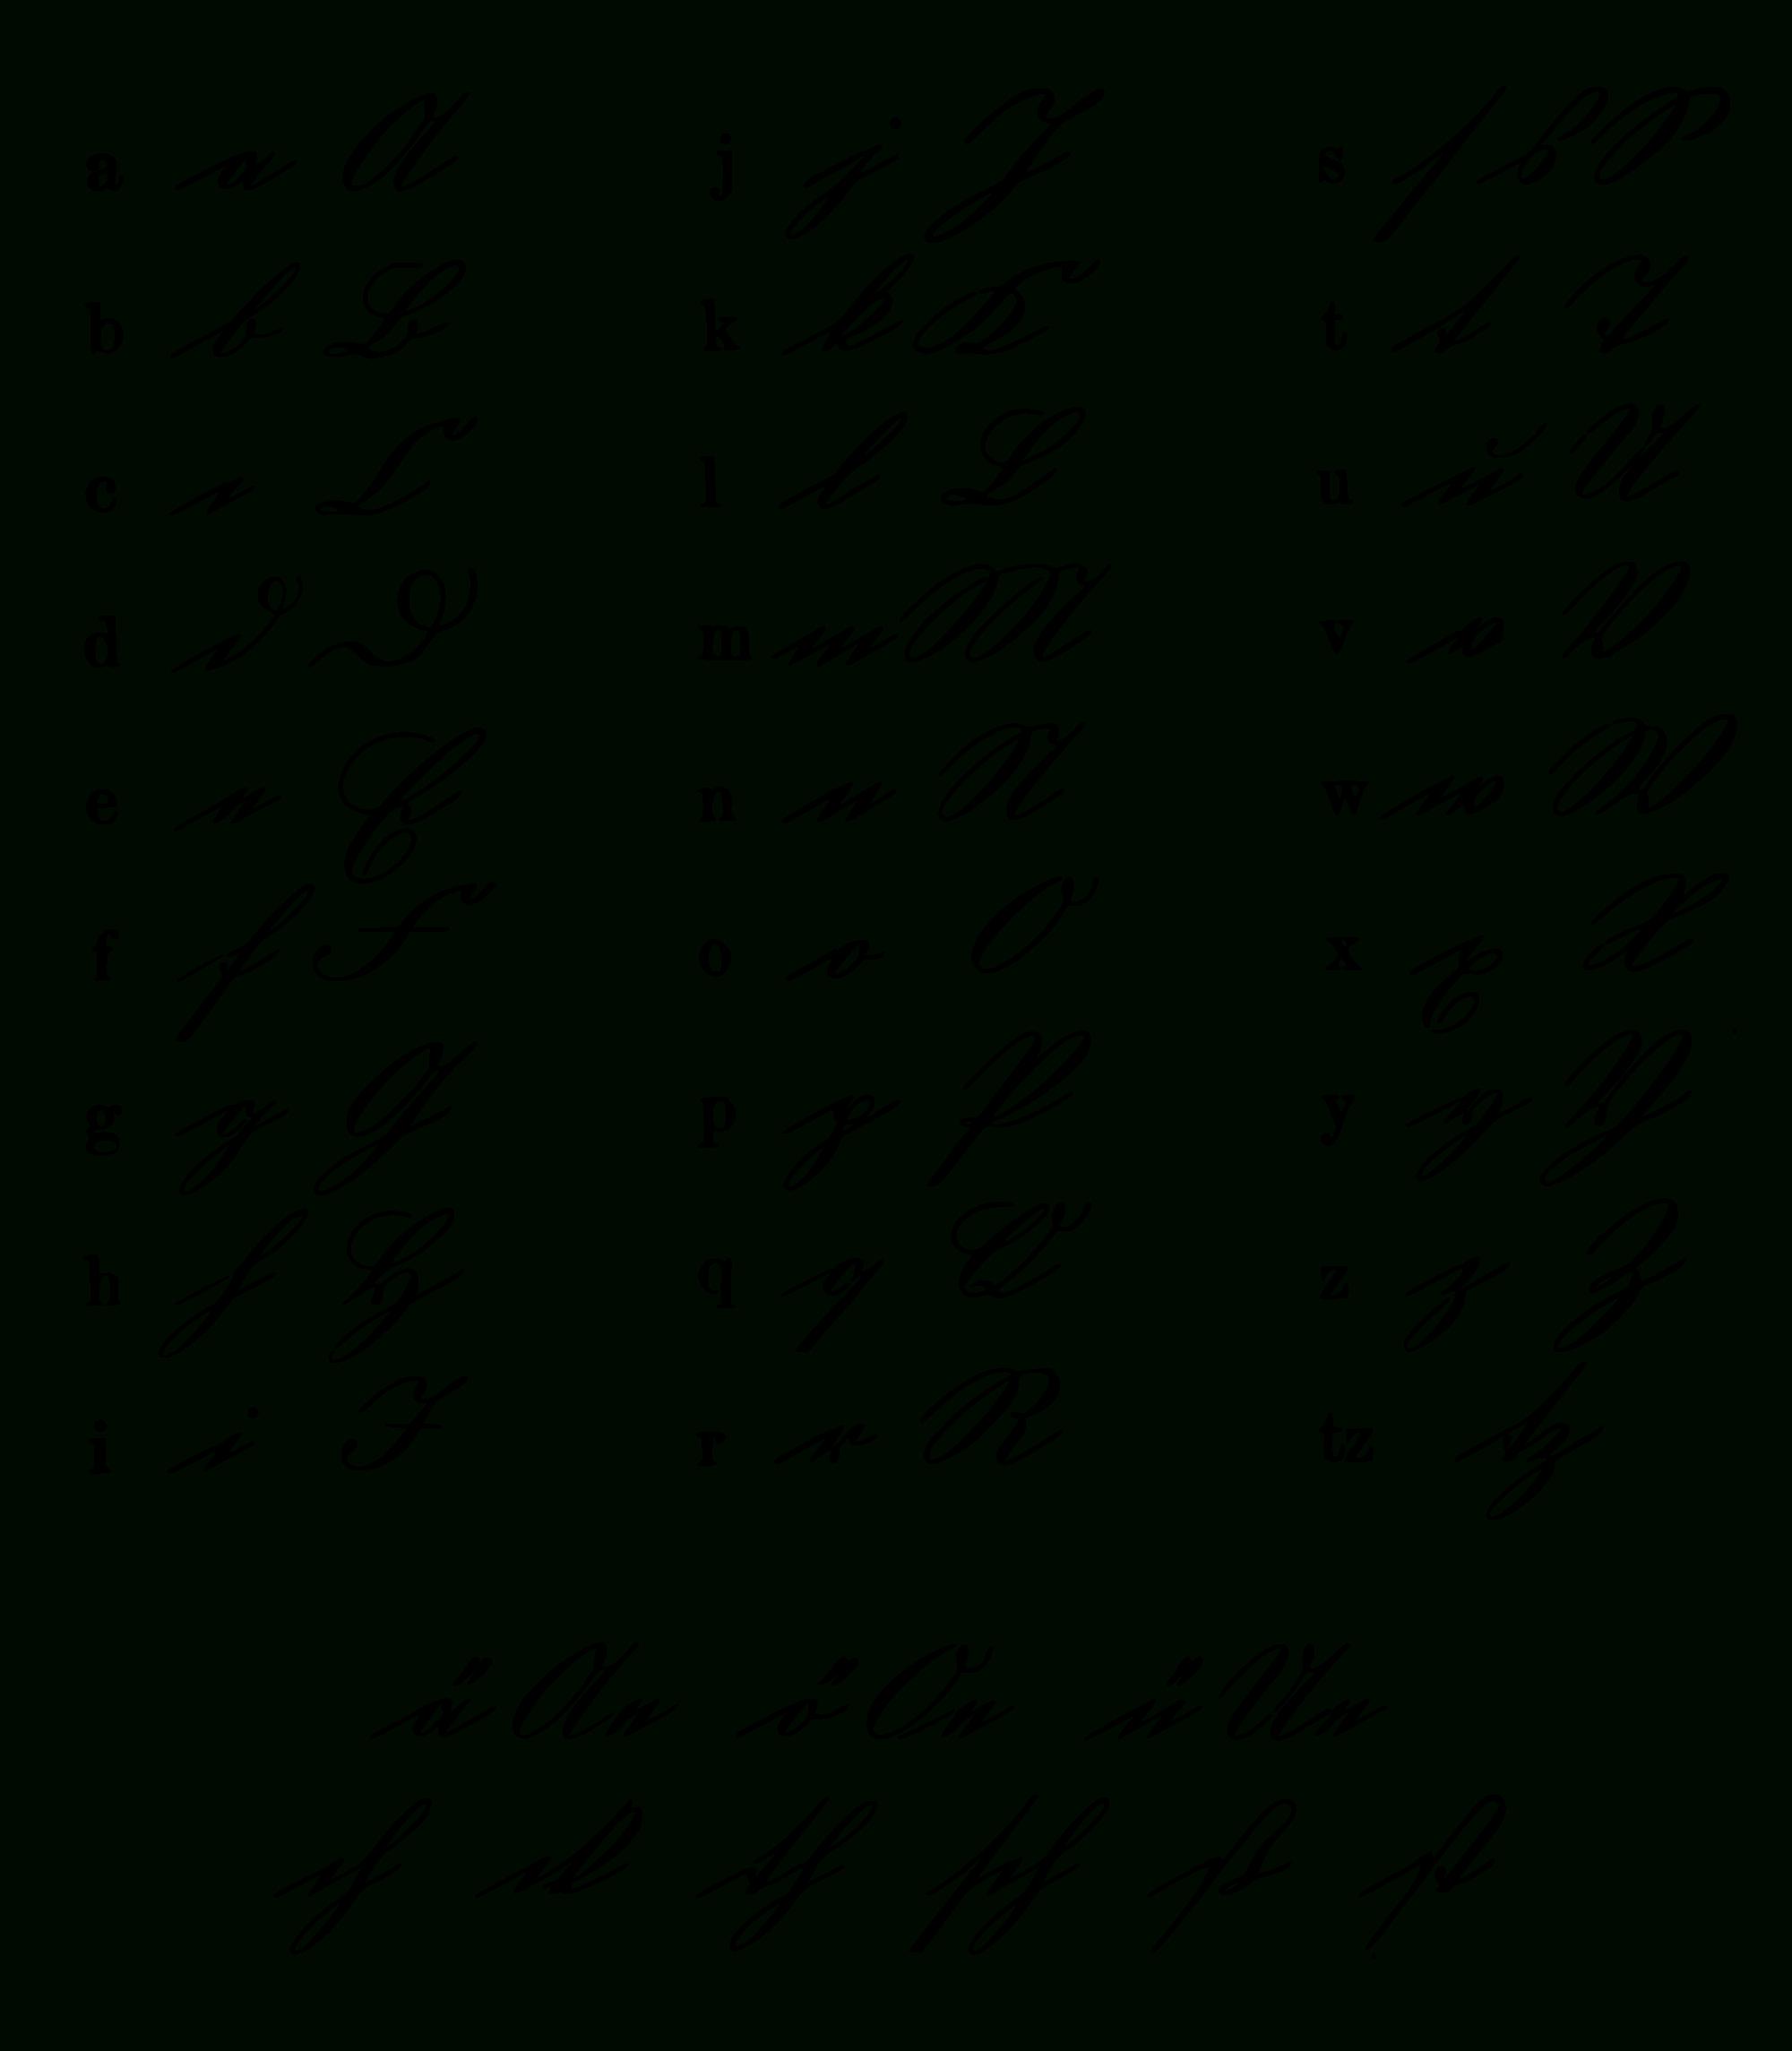 Alphabet Der Kurrentschrift, Um 1865 Österreich à Alphabet Script Minuscule